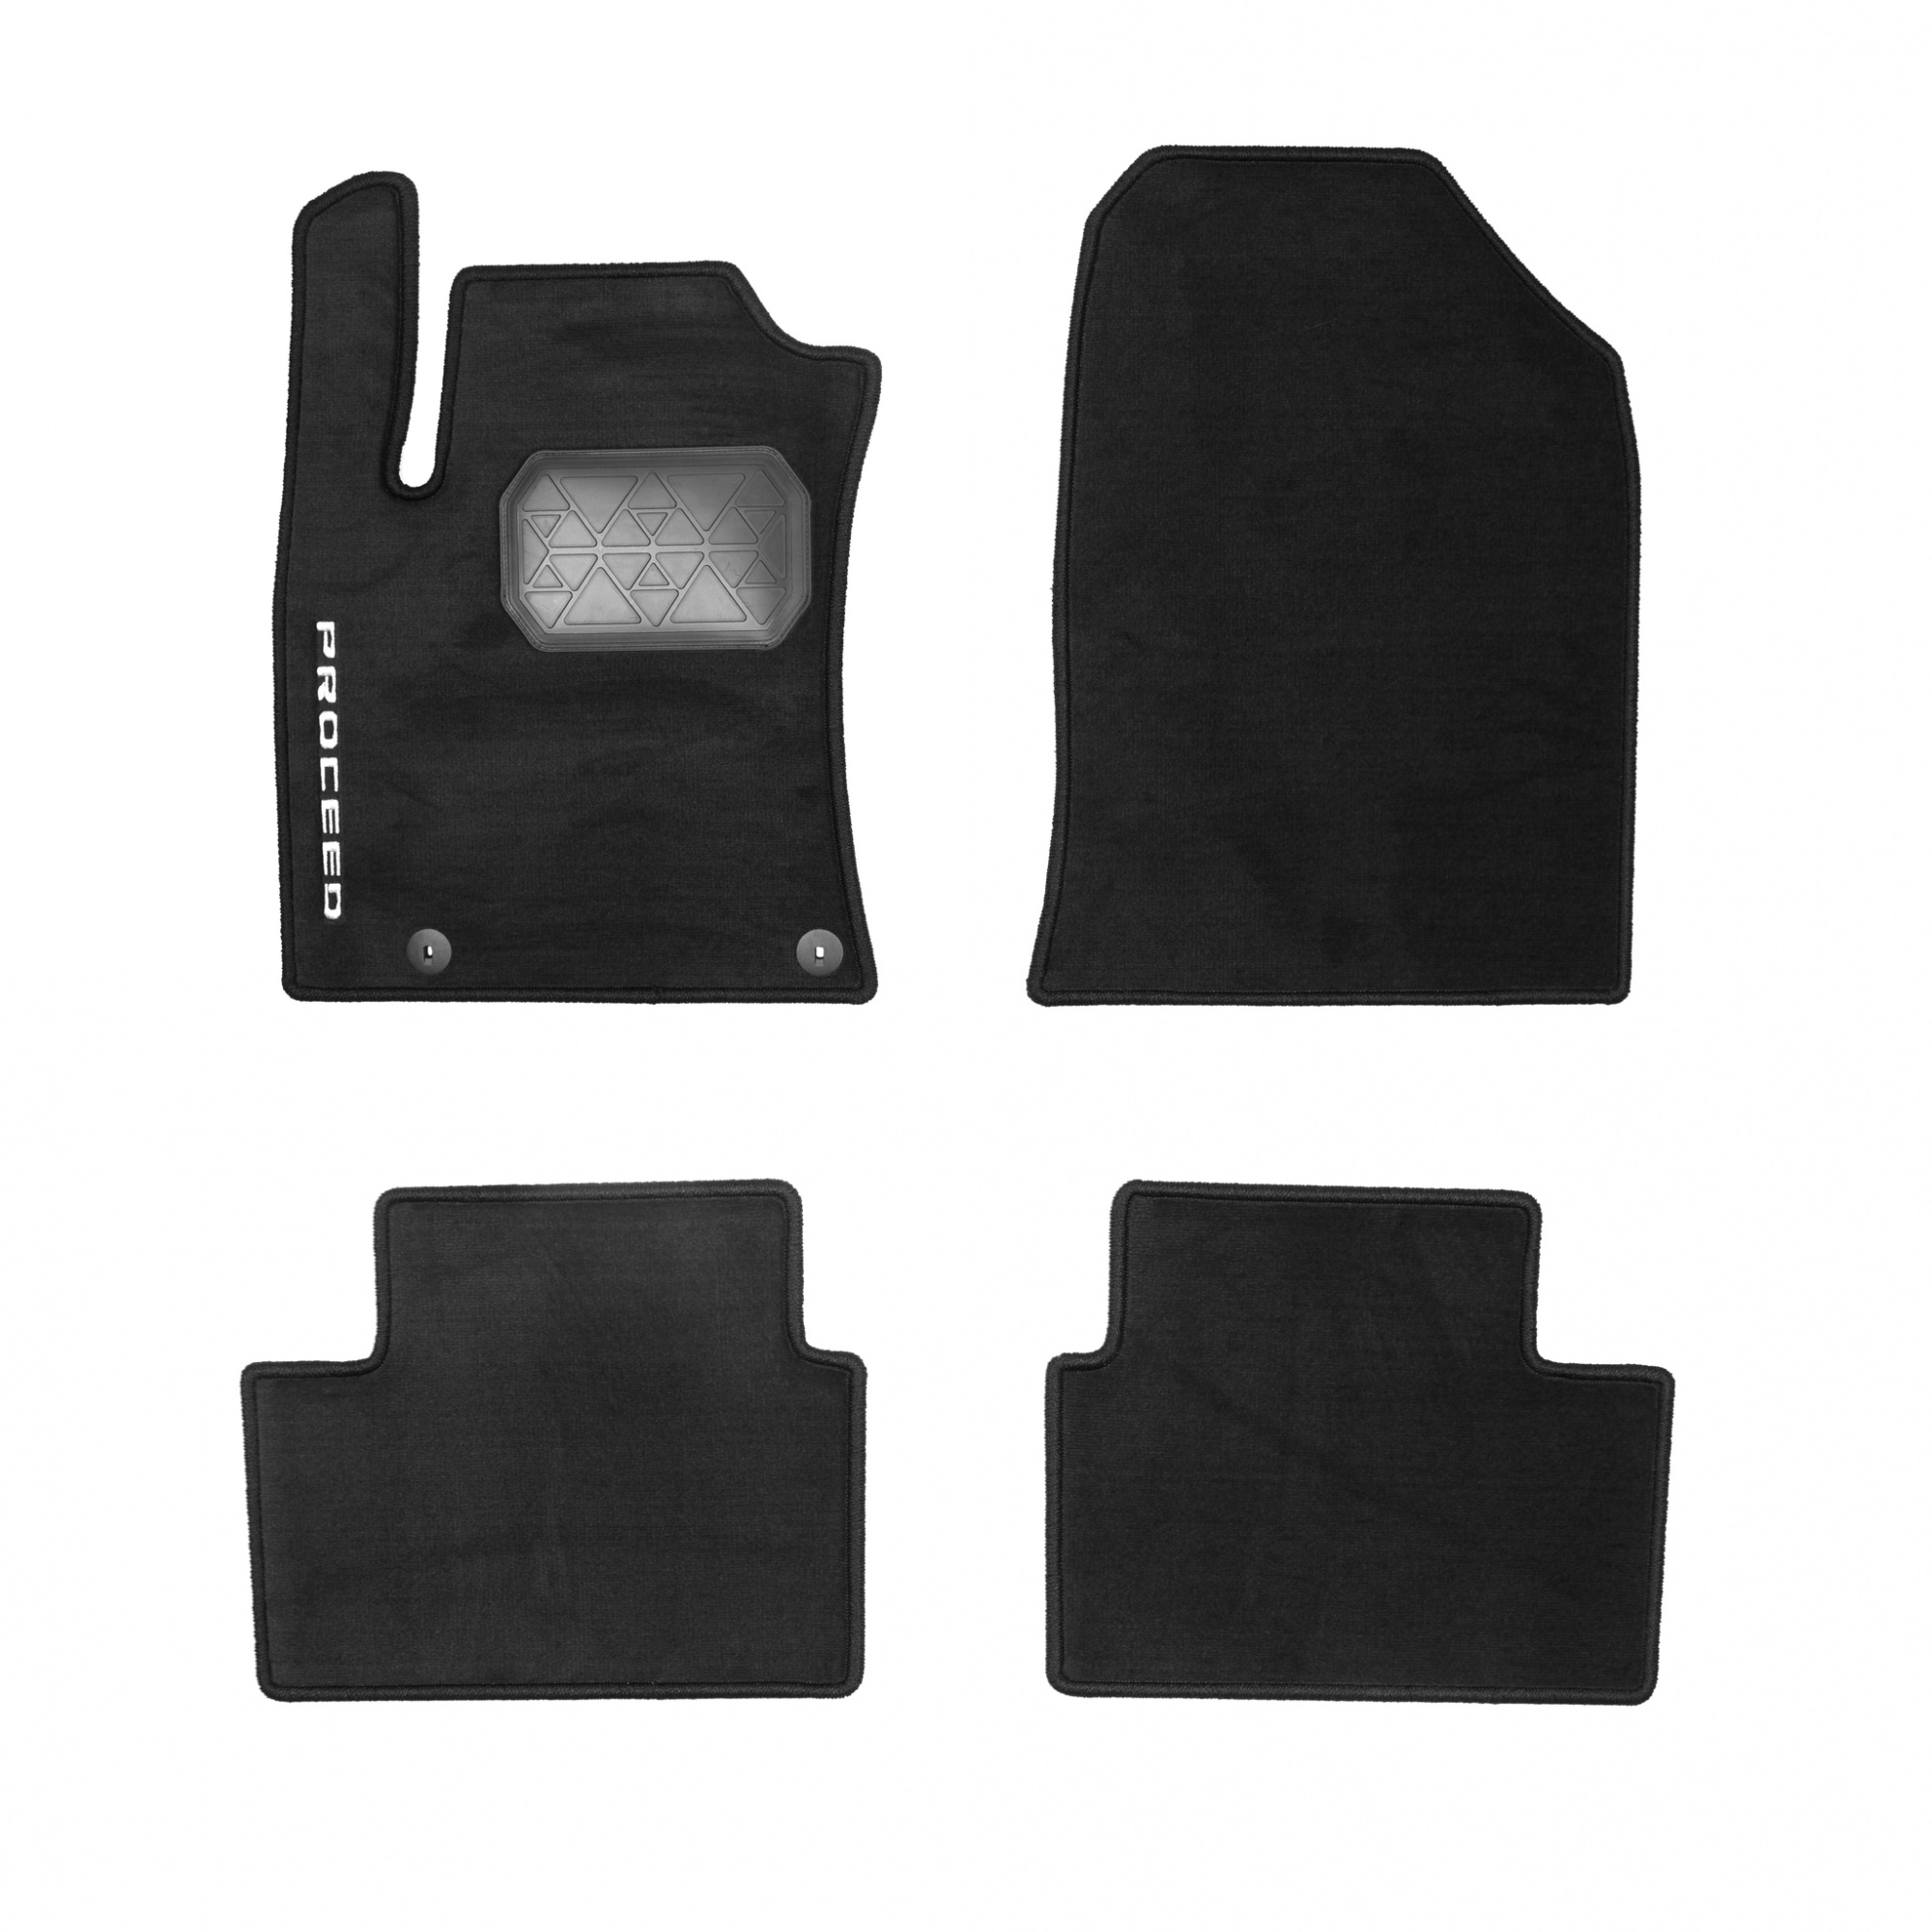 Коврики в салон Hyundai/KIA велюр черный R8140J7300 KIA ProCeed 2019- коврики в салон hyundai kia велюр черный a2143ade00st kia ceed 3g 2018